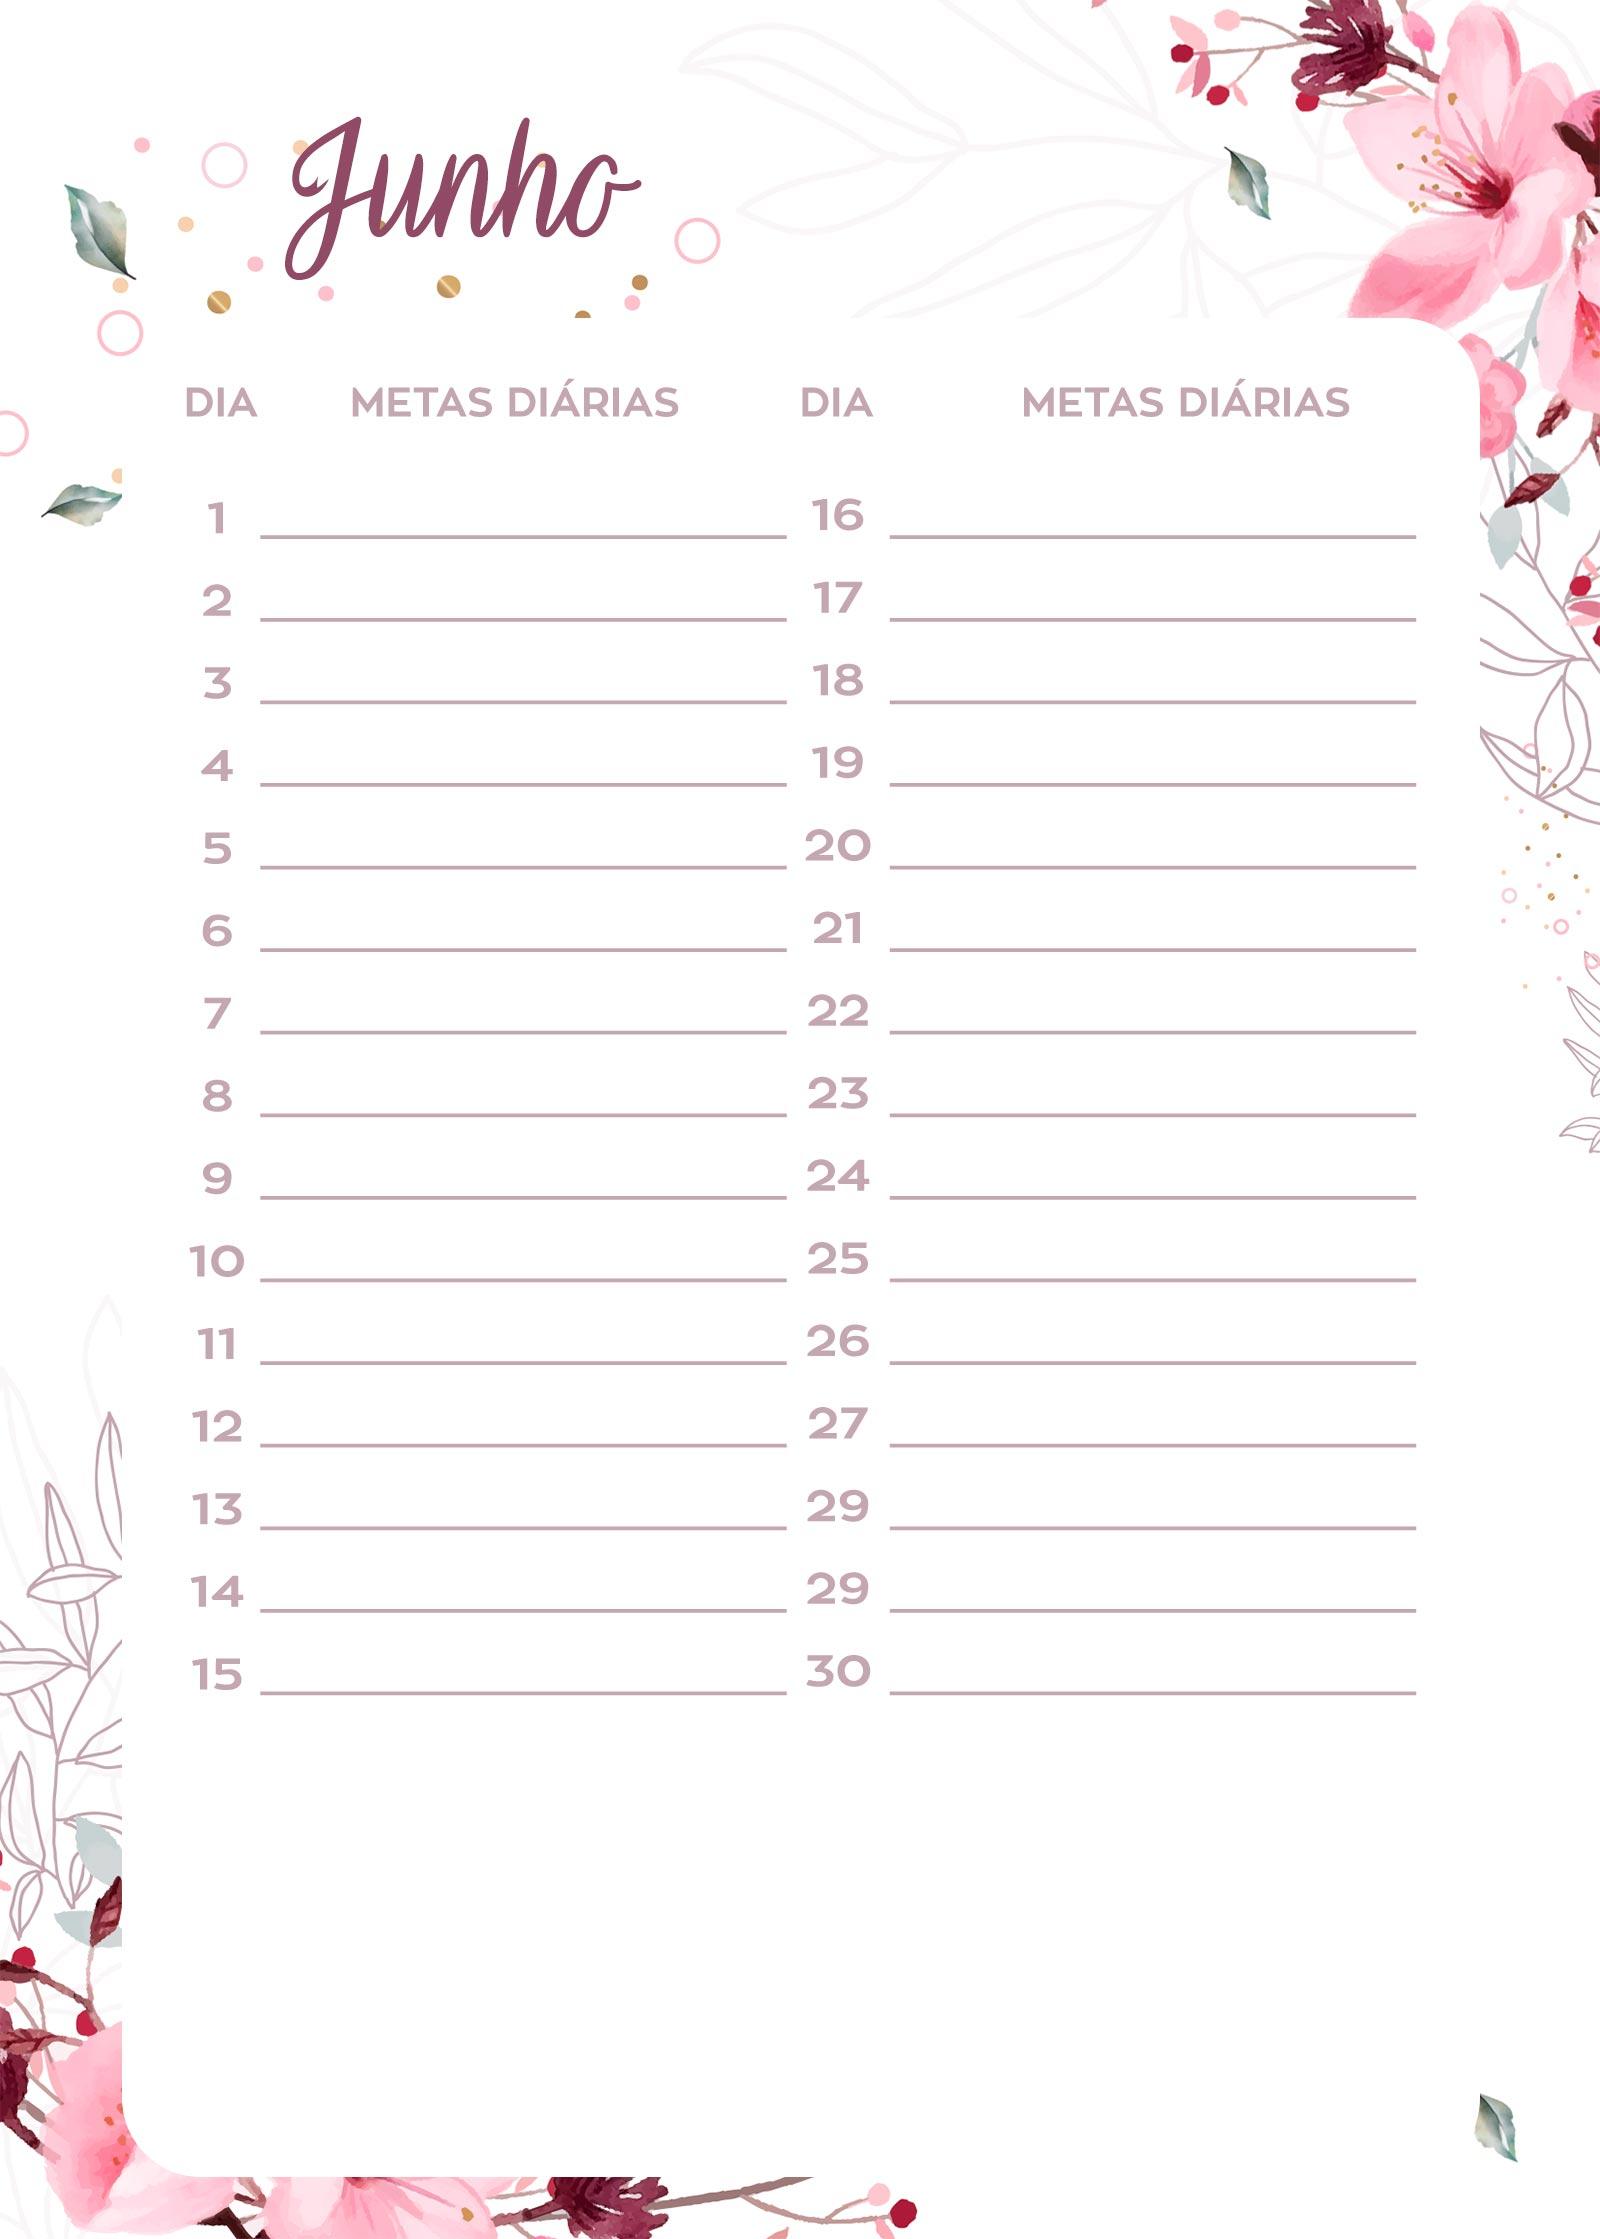 Planner Floral metas diarias junho